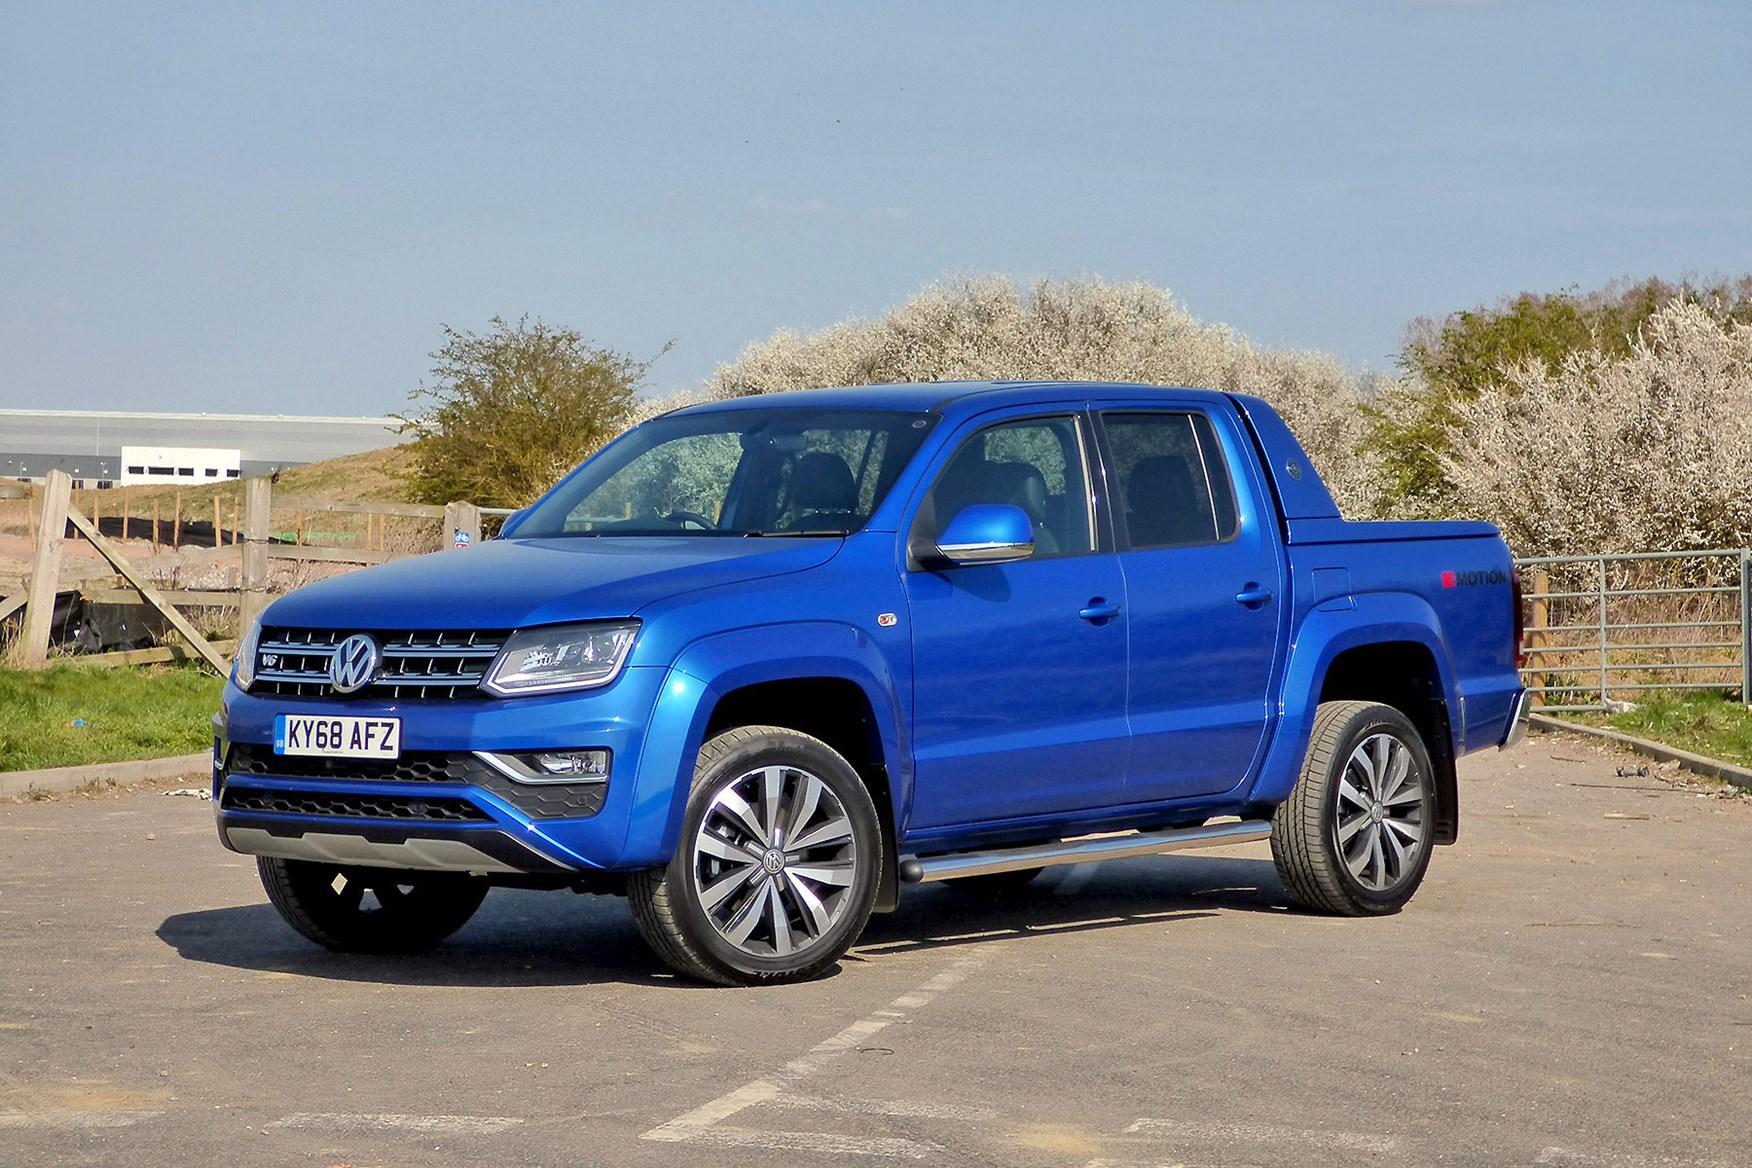 Volkswagen Amarok pickup review (2011-on)   Parkers